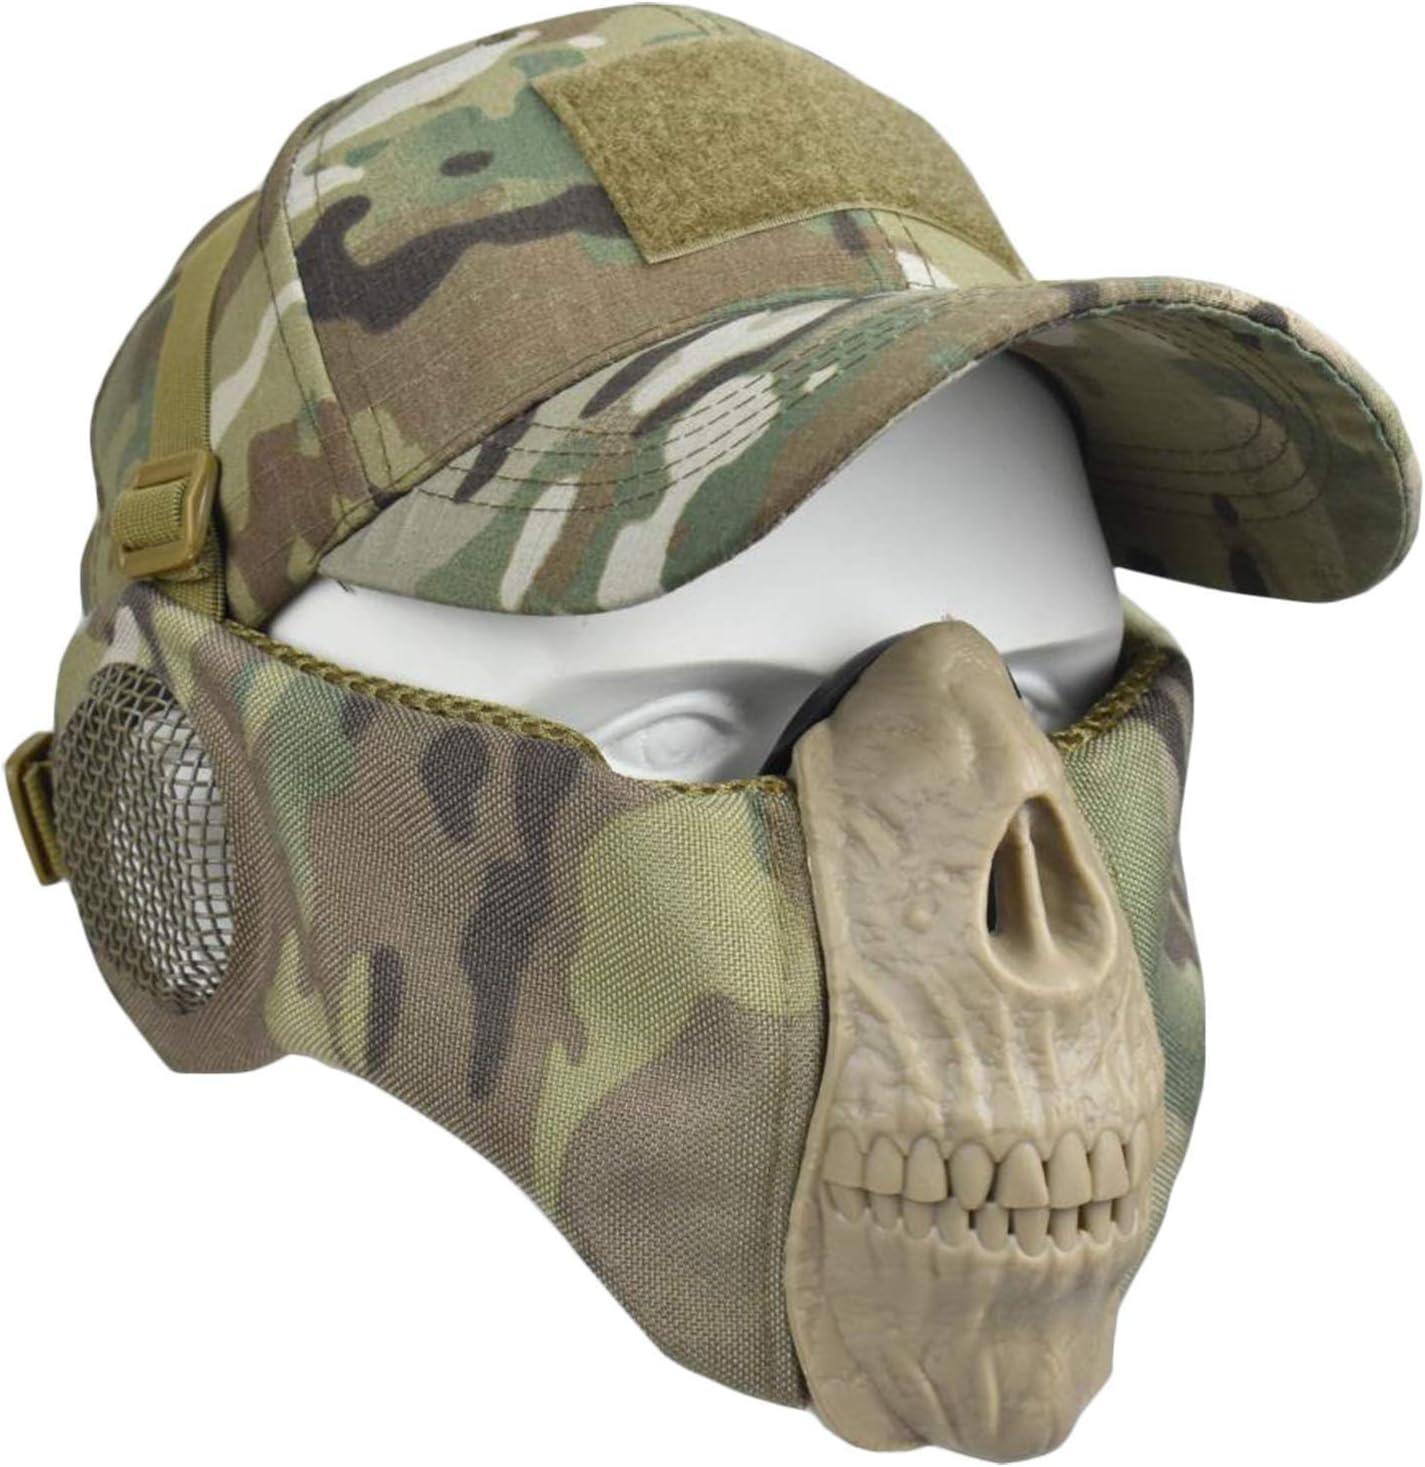 WLXW Airsoft Masks -Máscara de Calavera de Media Cara con Protección para Los Oídos Y Gorra de Béisbol Ajustable para Airsoft/Paintball/BB Gun/CS Game/Hunting/Shooting